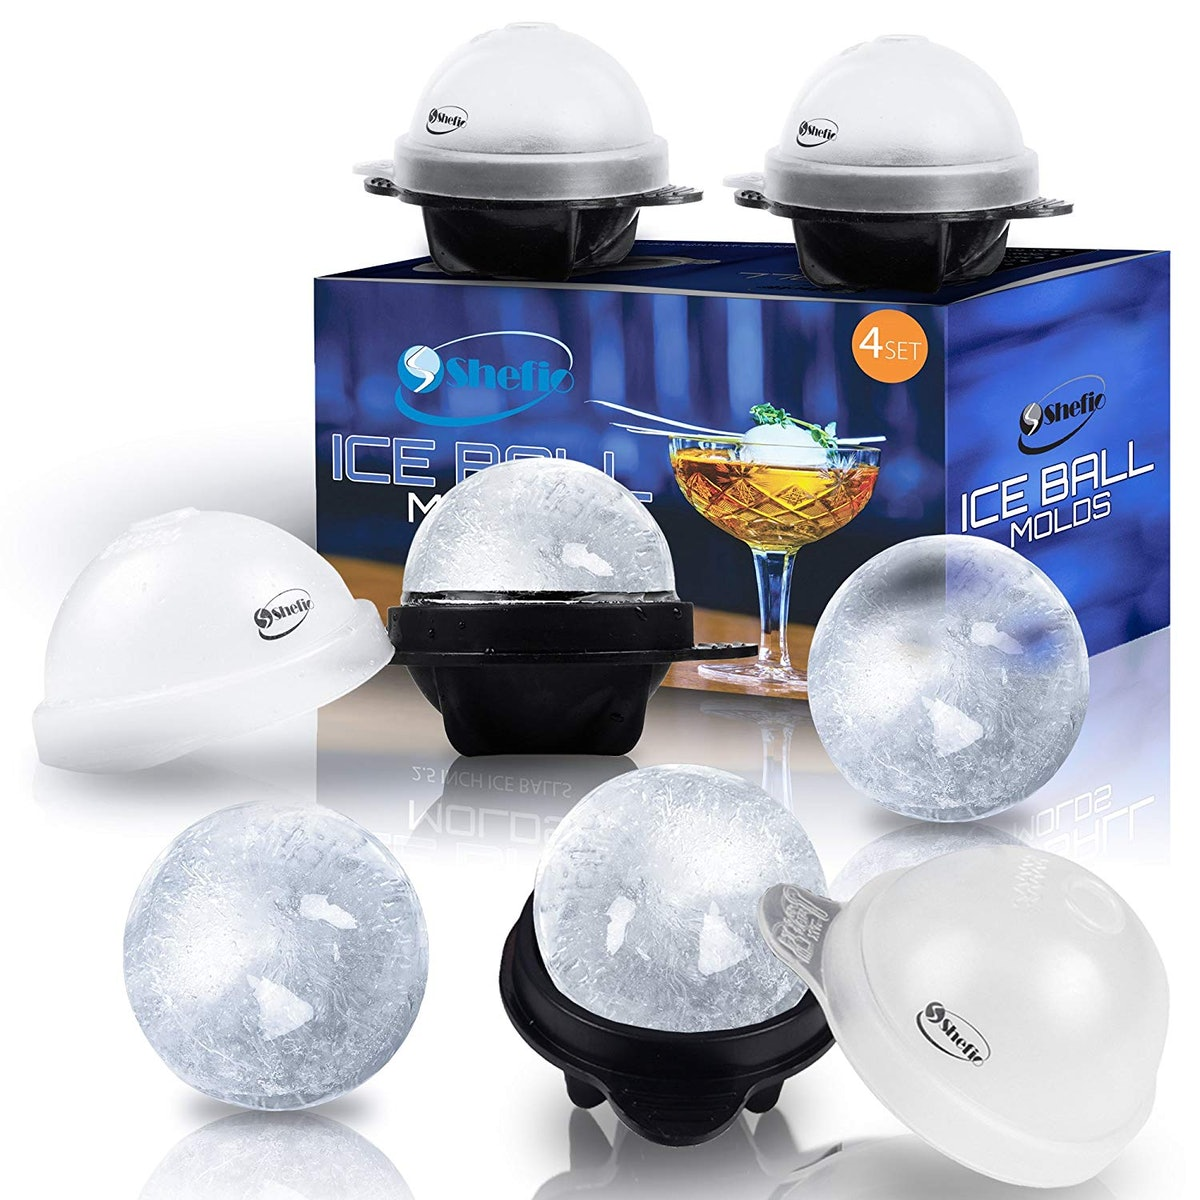 Shefio Ice Ball Molds